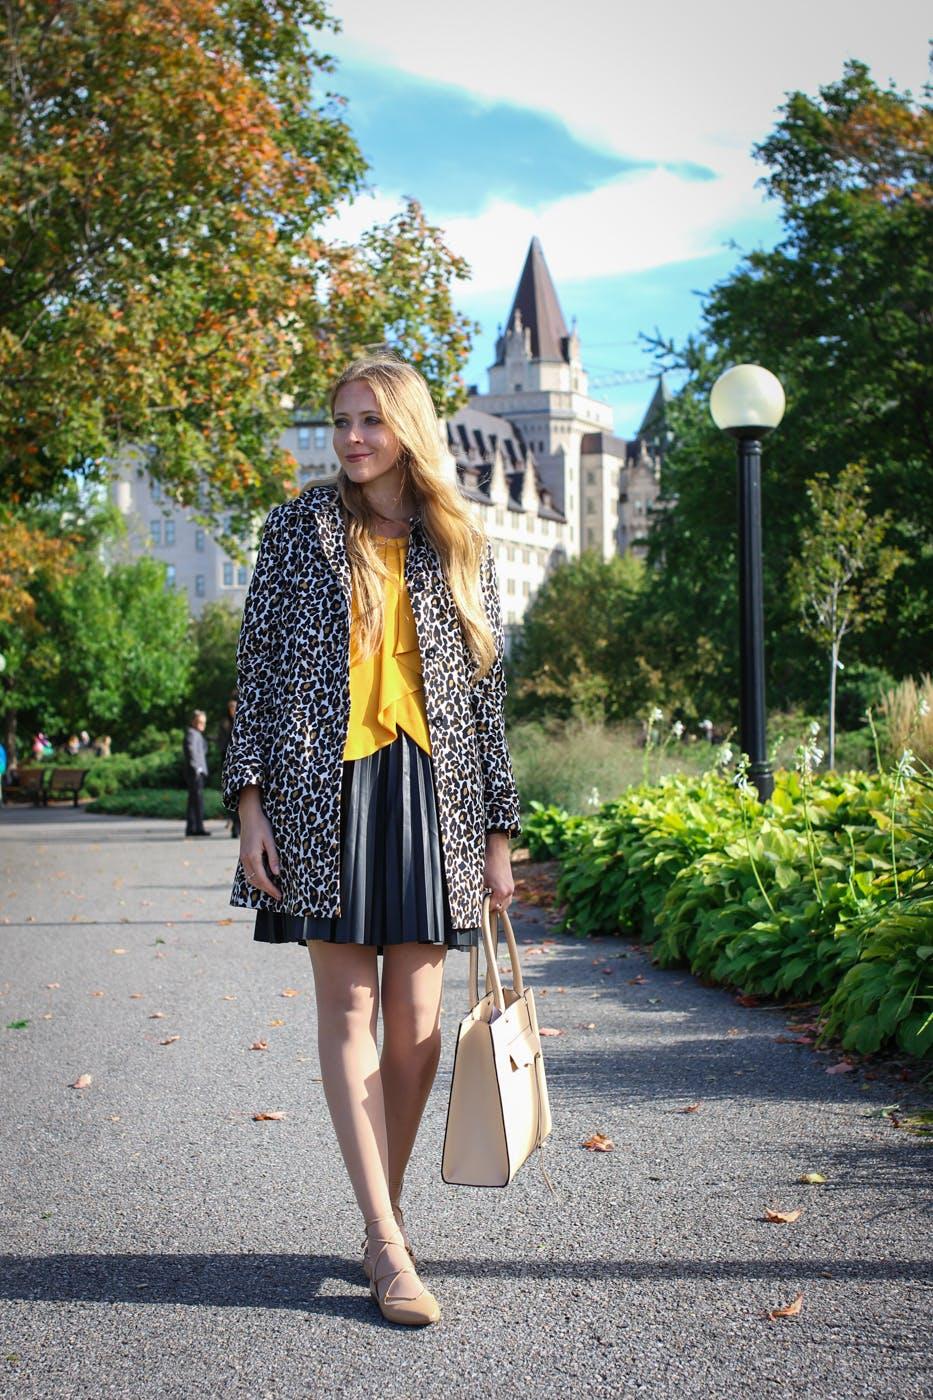 Work Wear Wednesday: Leopard coat & lace up flats